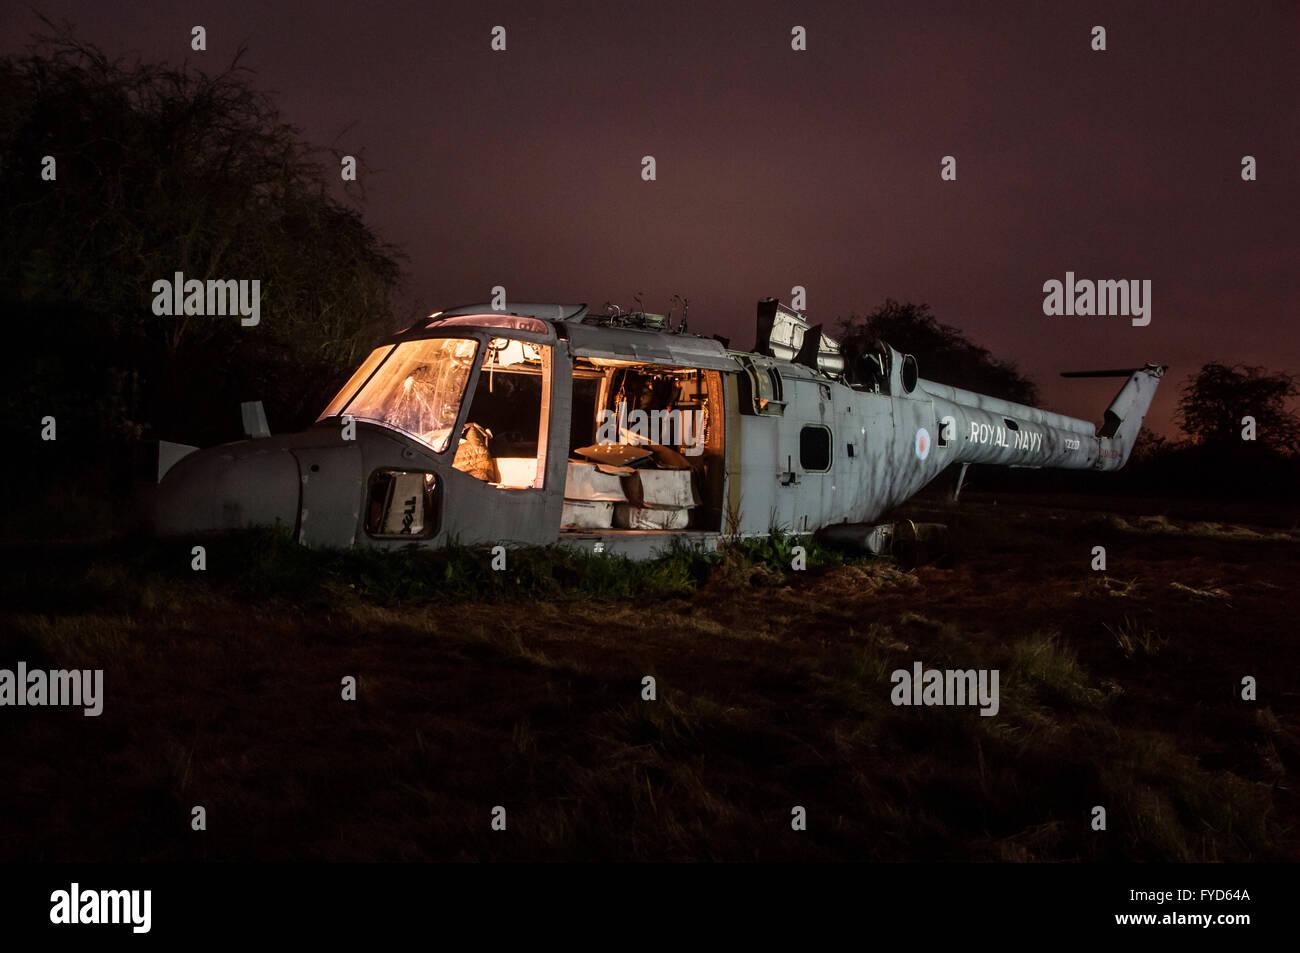 Abandoned helicopter, Derbyshire. - Stock Image